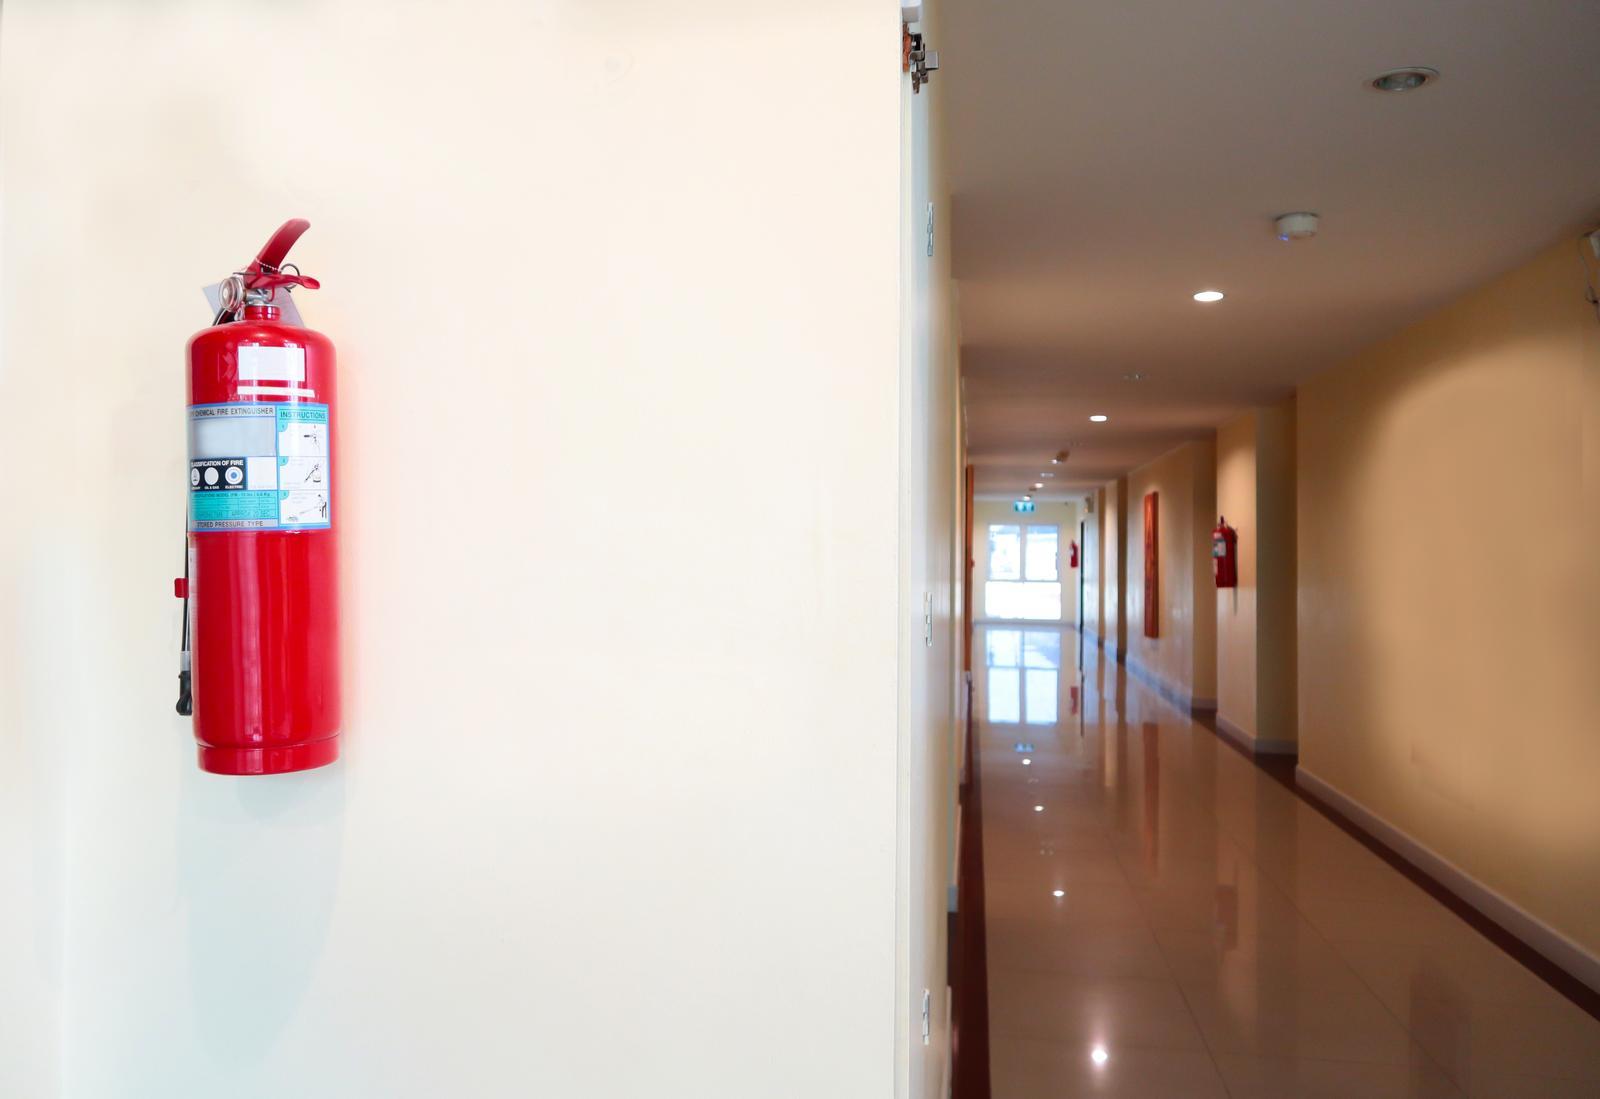 Installation of fire and burglar alarm systems in Tallinn